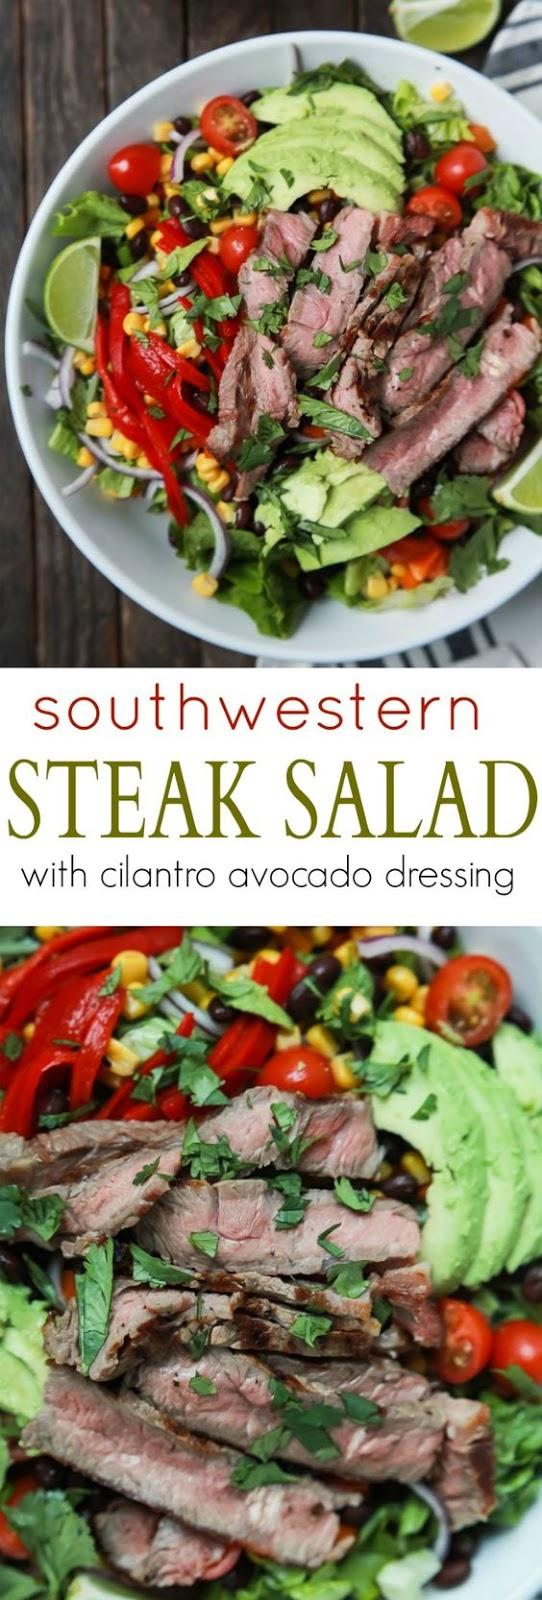 Southwestern Steak Salad with Cilantro Avocado Dressing images